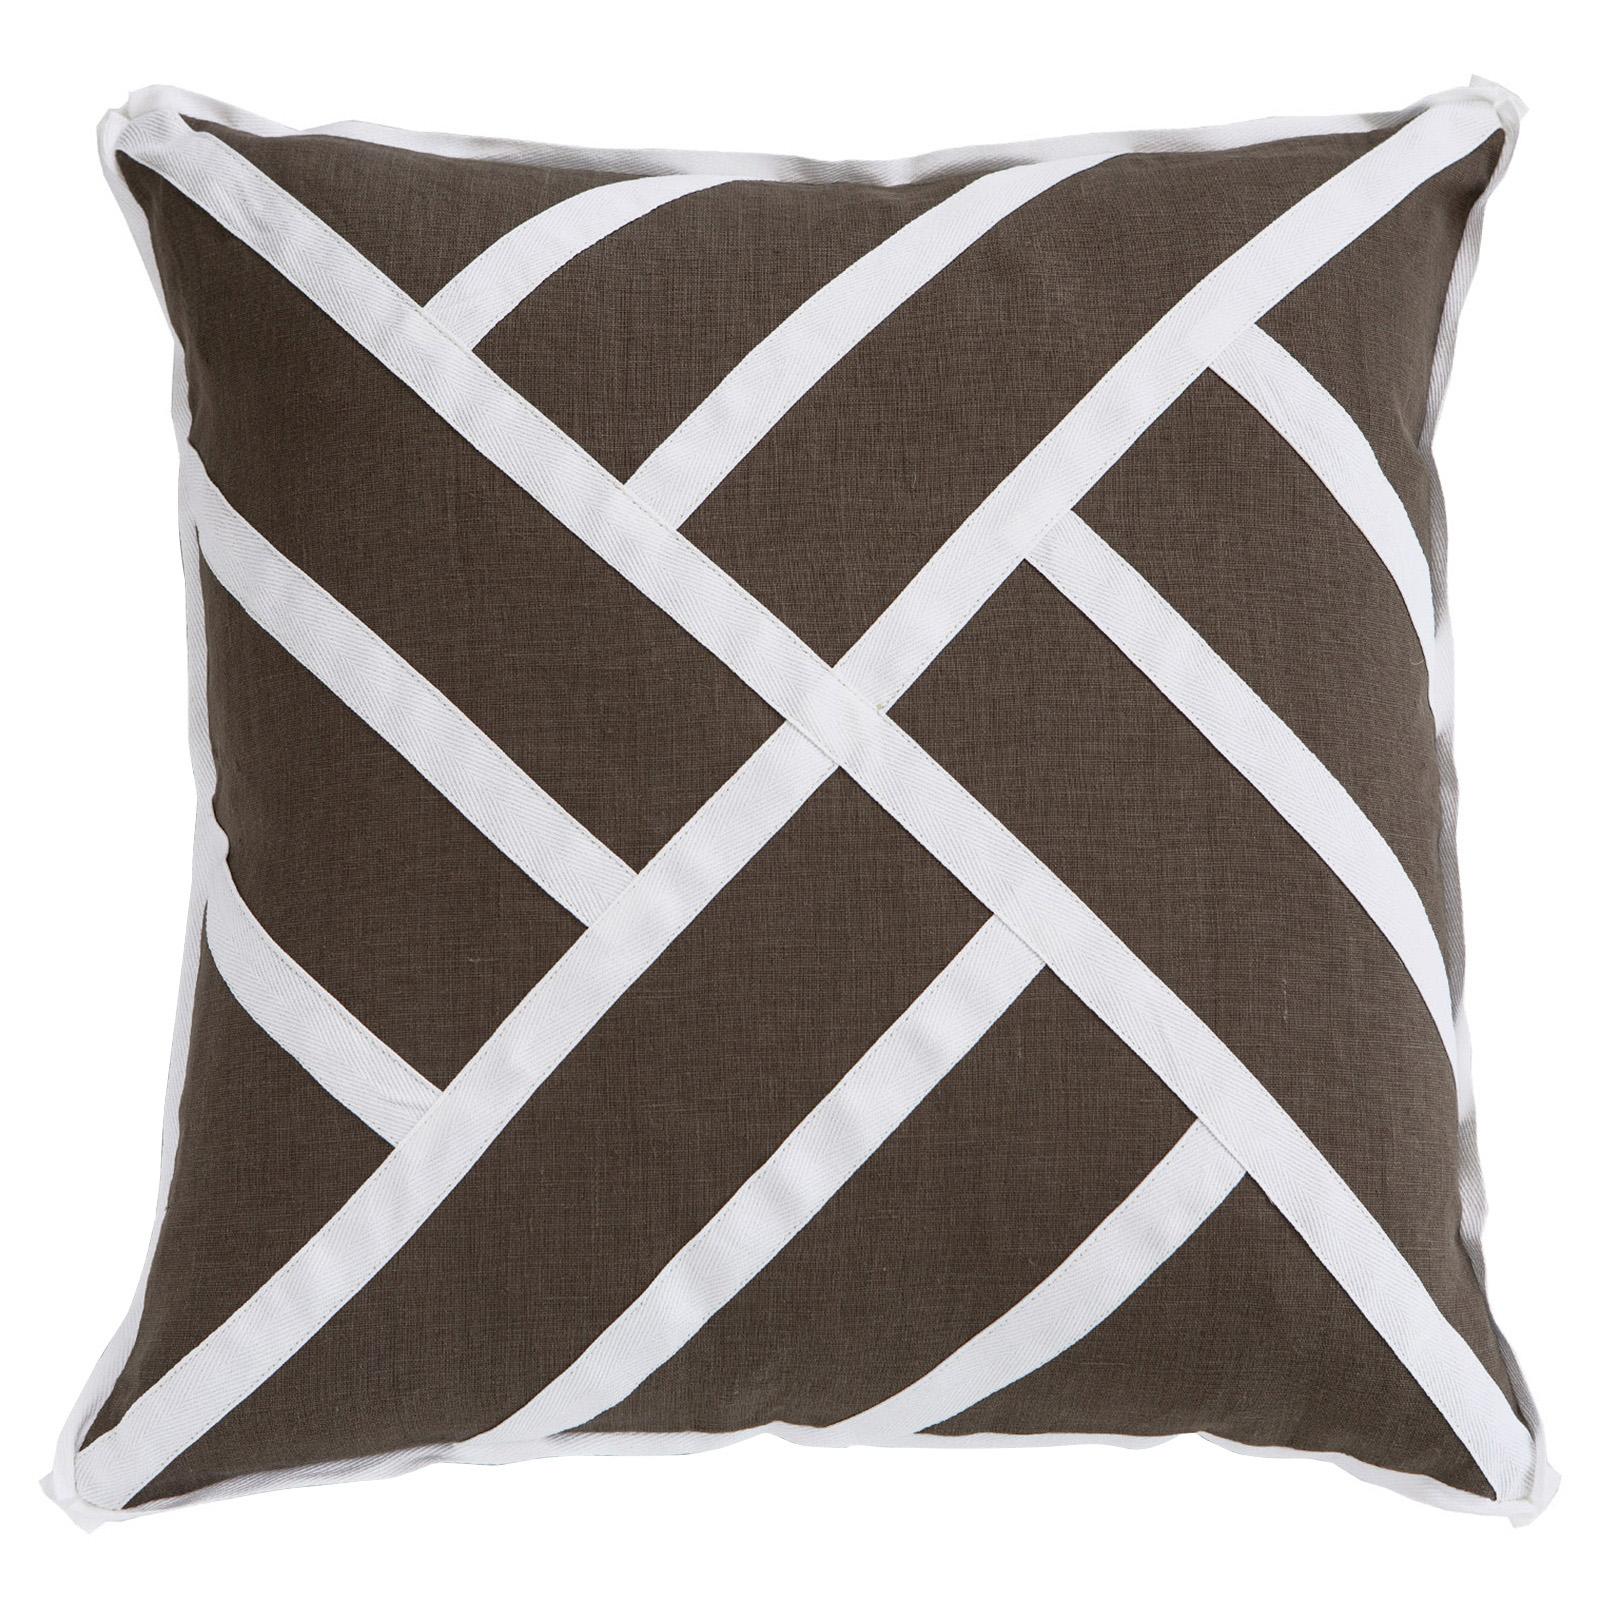 Tab Modern Classic Brown Pinwheel Pillow - 22x22